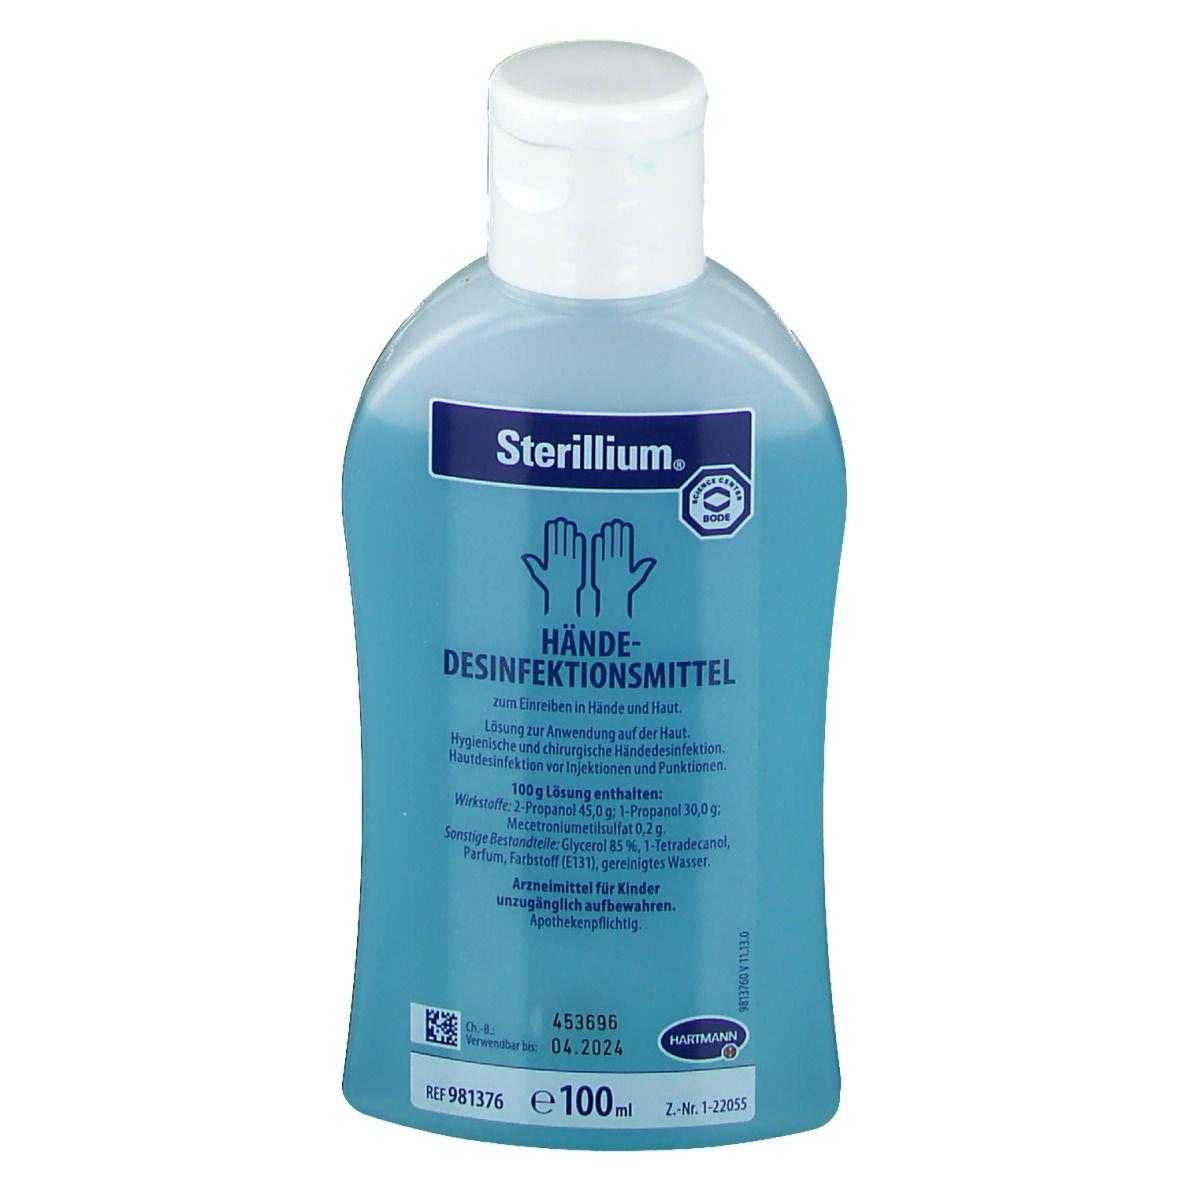 Sterillium® Handdesinfektionsmittel 100 ml